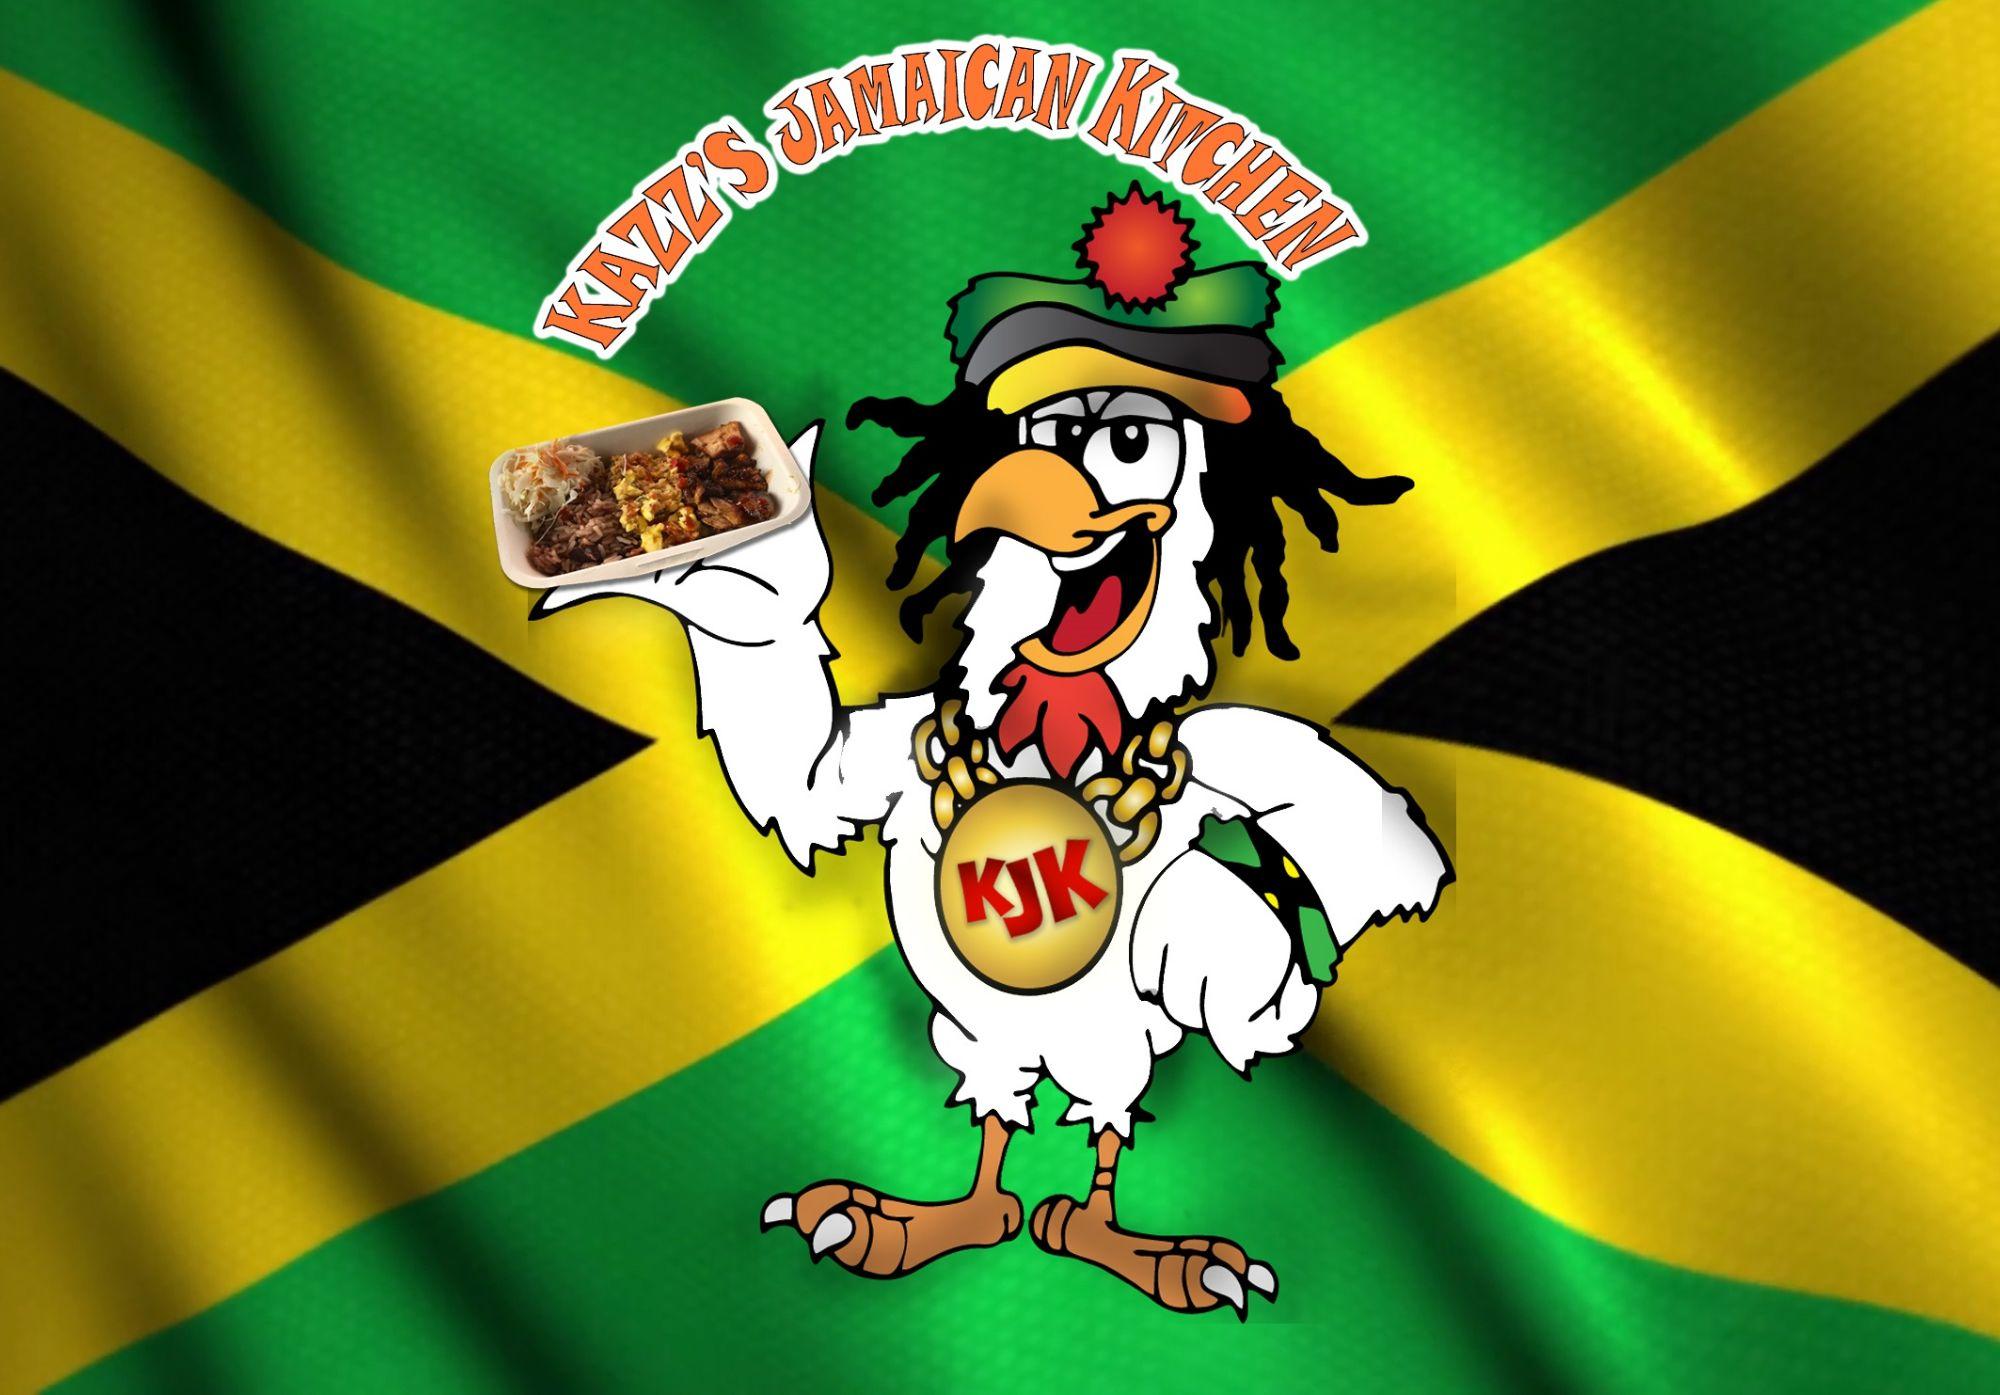 KAzz's Jamaican Kitchen Perth, Western Australia